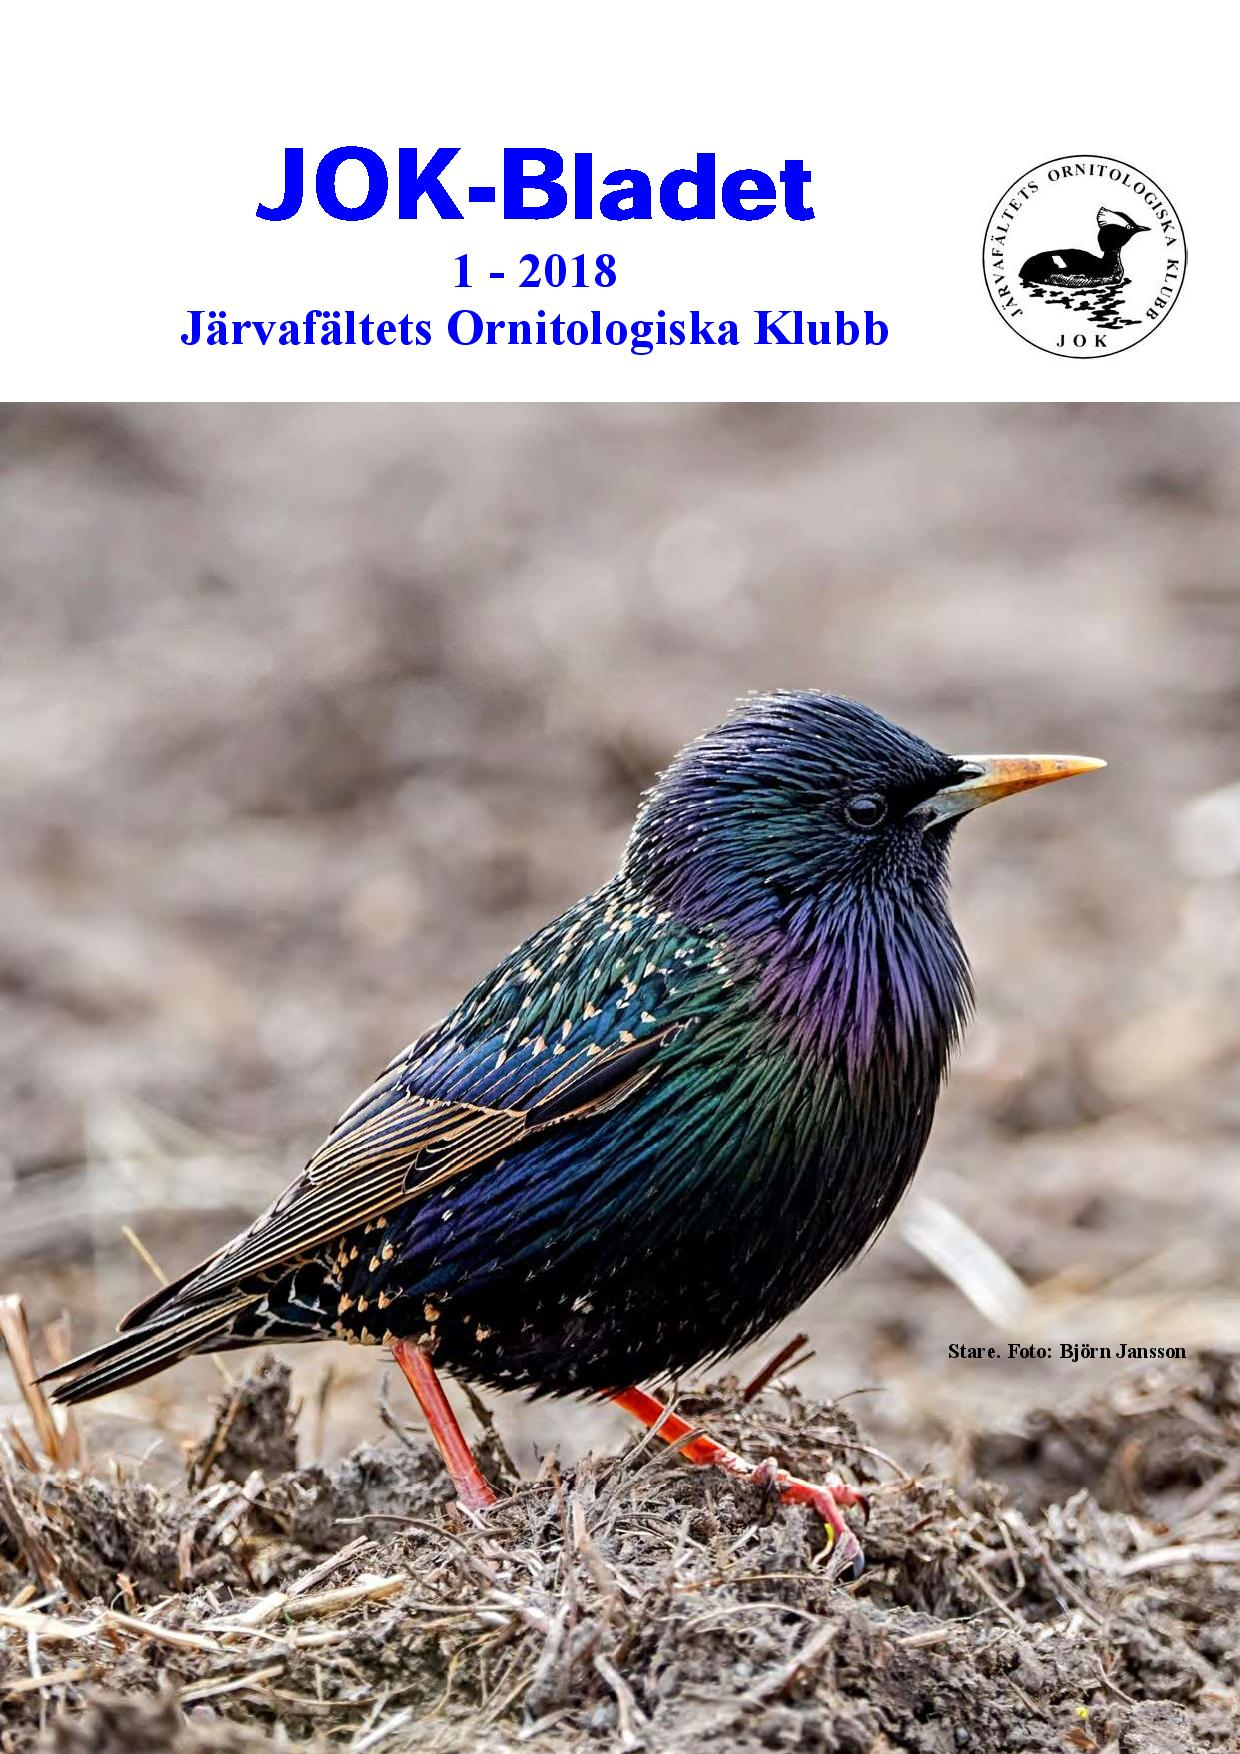 JOK-Bladet 2018-1